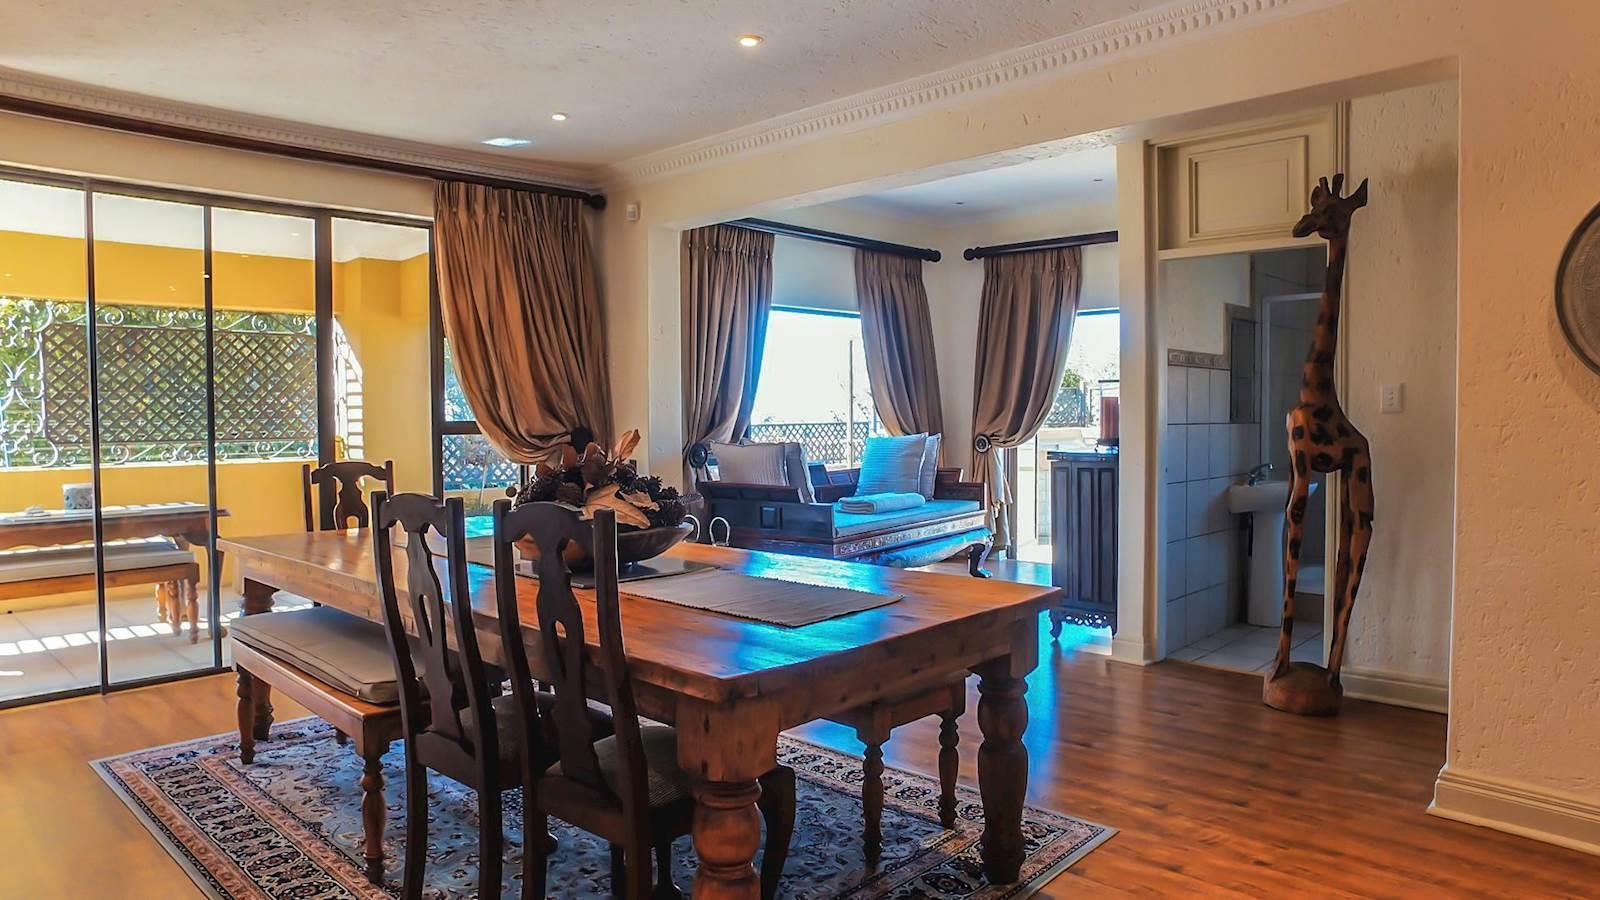 Randburg, Fairland Property  | Houses For Sale Fairland, Fairland, House 3 bedrooms property for sale Price:3,500,000